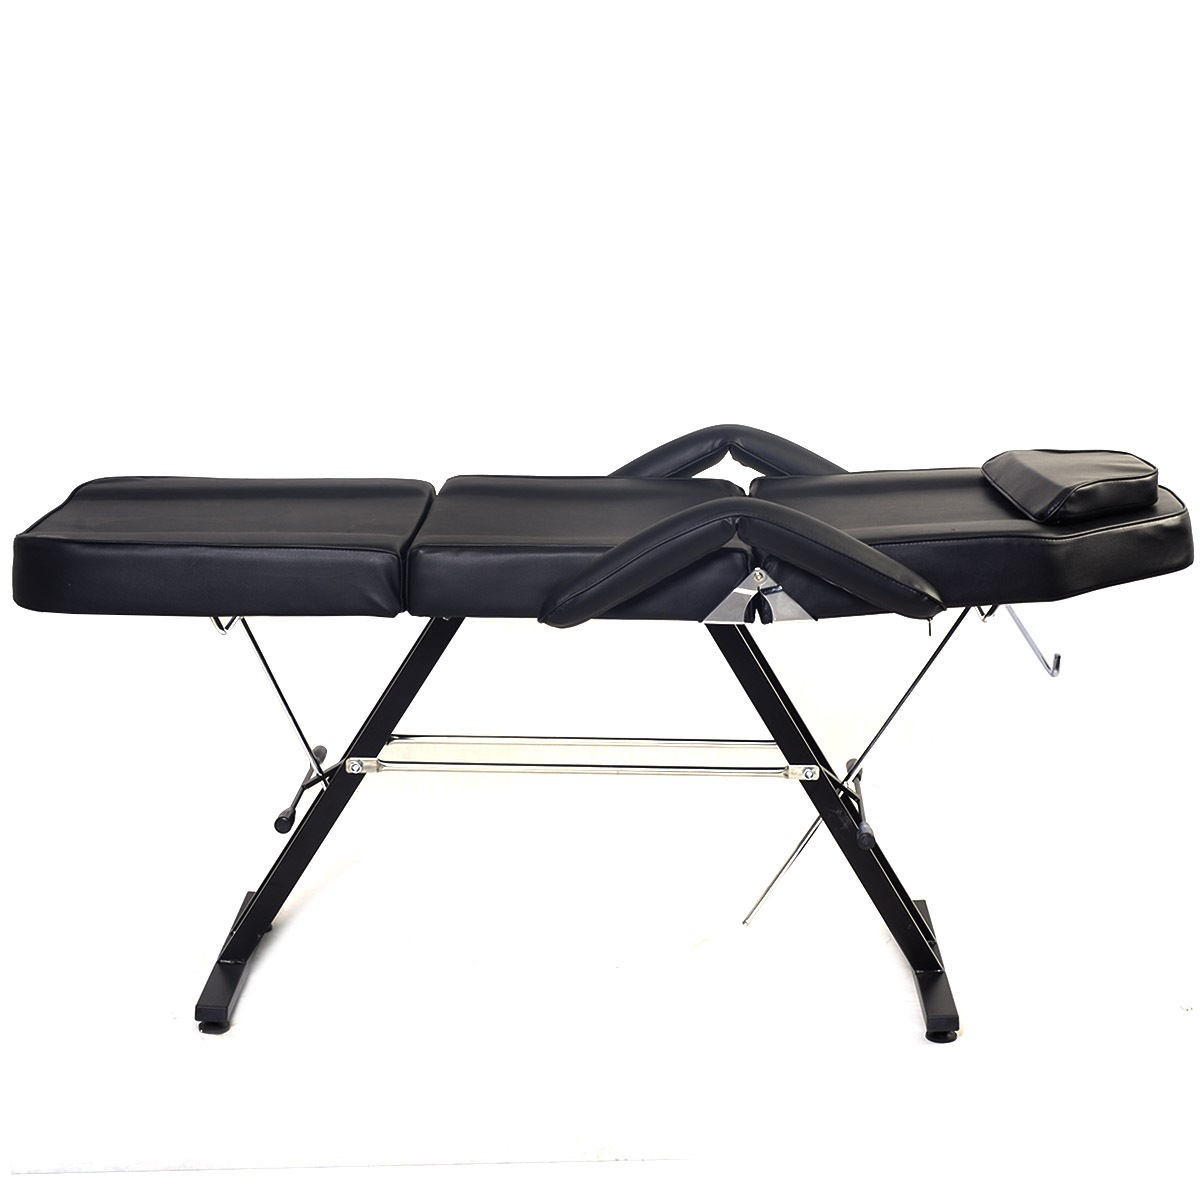 Silla camilla spa masaje 5 en mercado libre - Sillas masaje ...